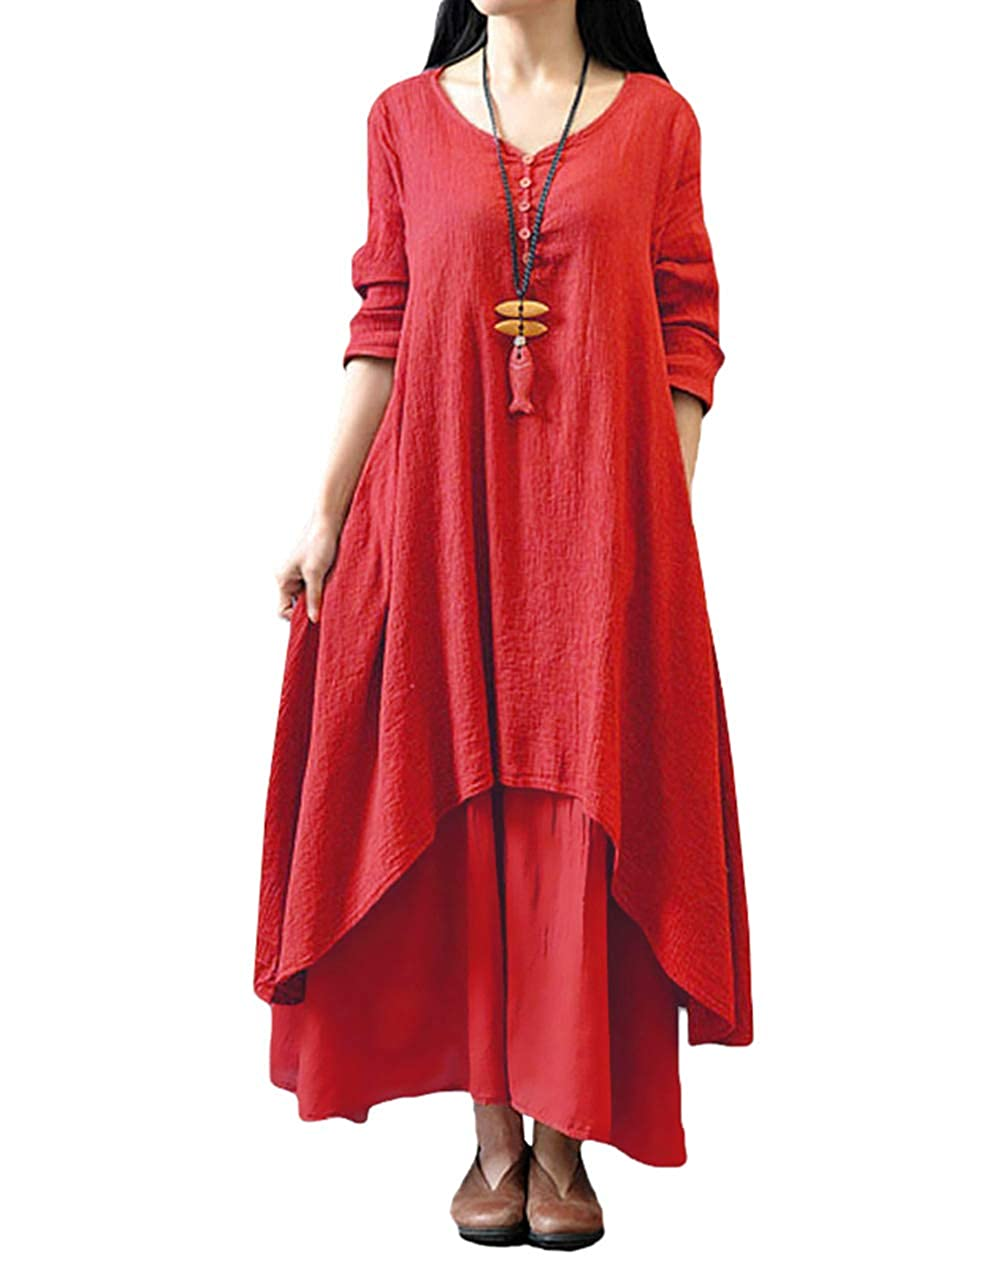 TALLA L. Romacci Vestido Suelto Vestido Ocasional de Las Mujeres Manga Larga Sólida Maxi Vestido Largo de Boho Rojo